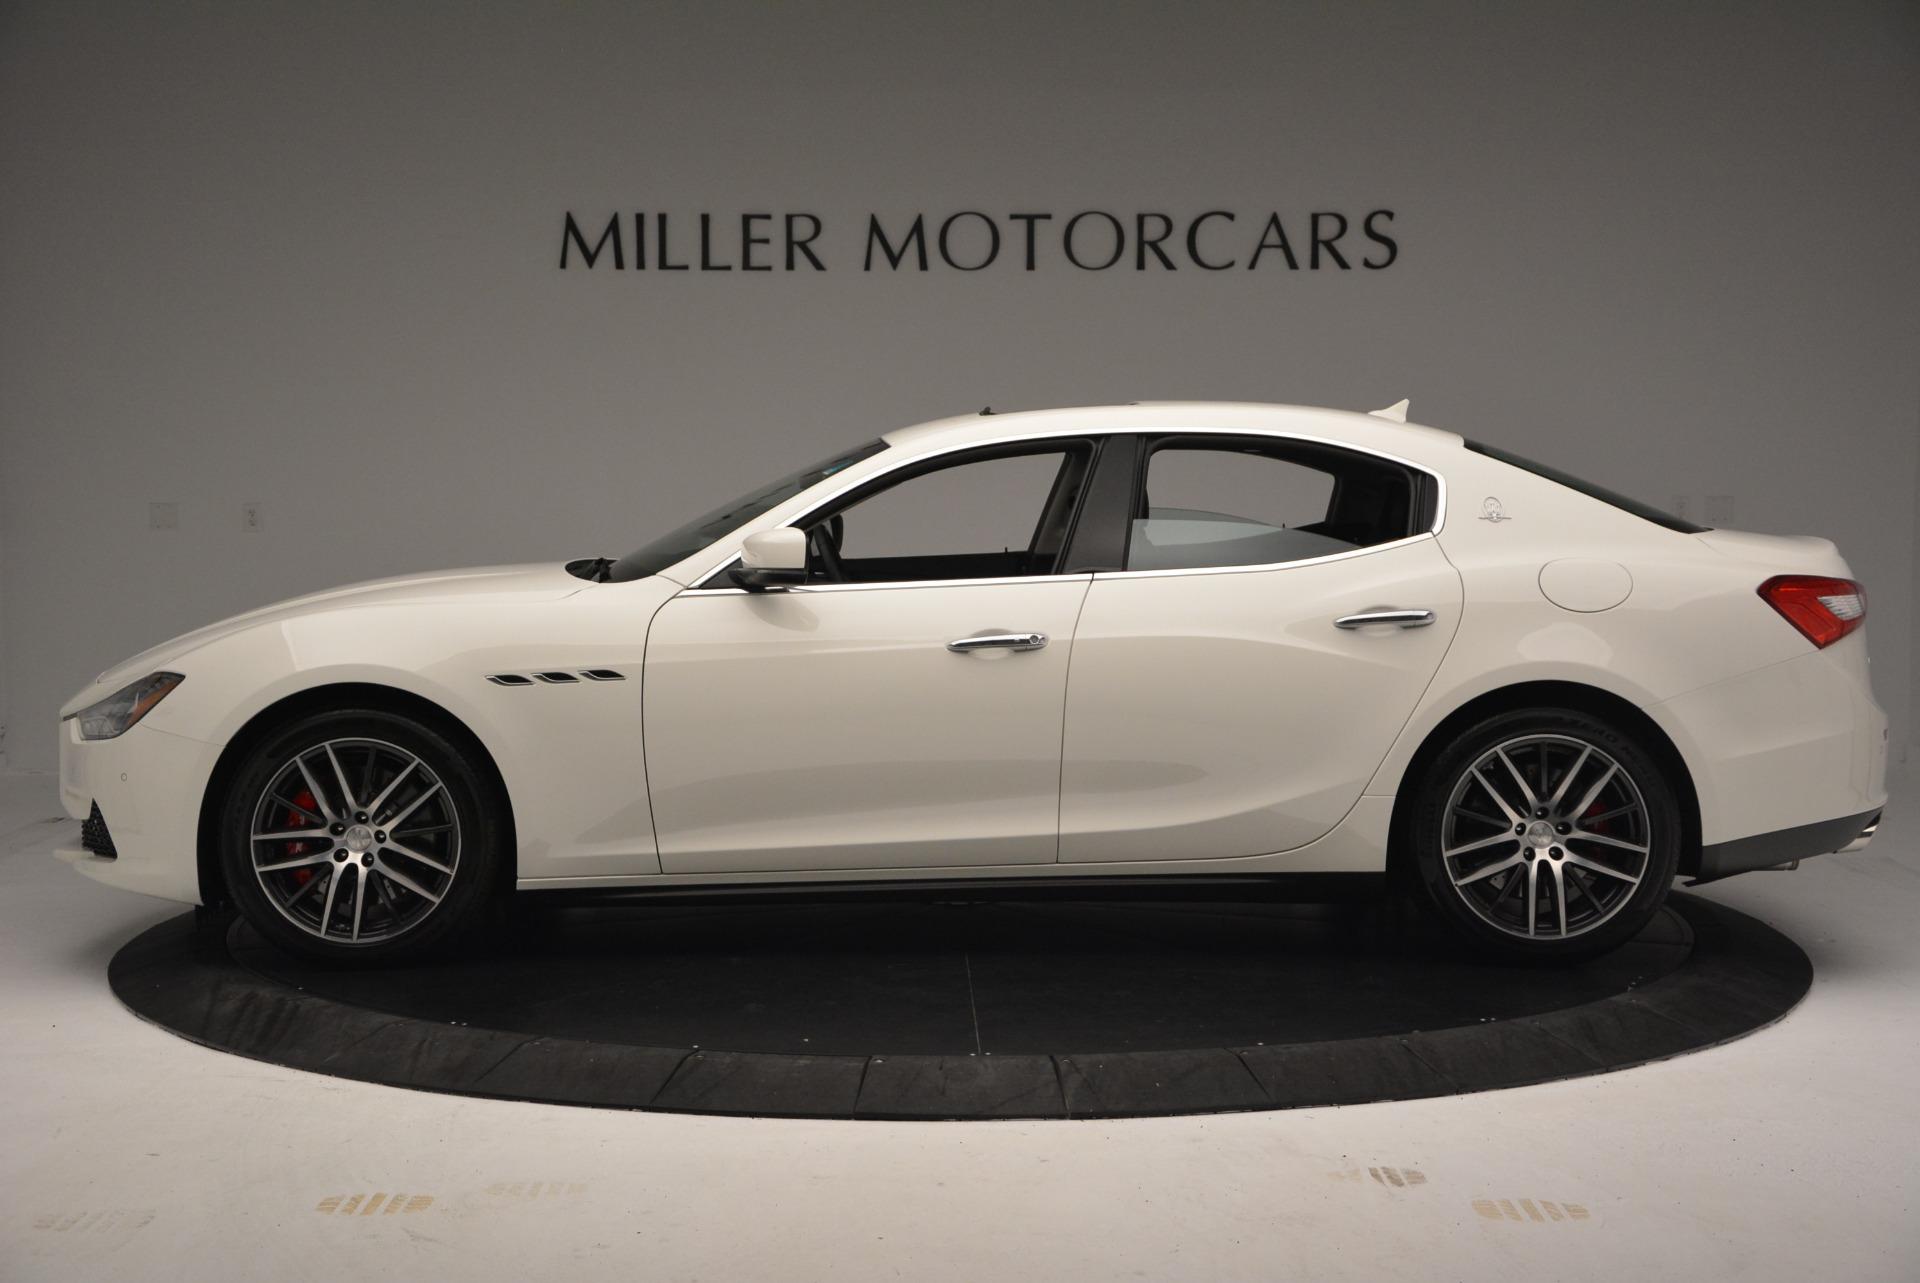 Used 2016 Maserati Ghibli S Q4  EX-LOANER For Sale In Greenwich, CT. Alfa Romeo of Greenwich, W252 669_p3